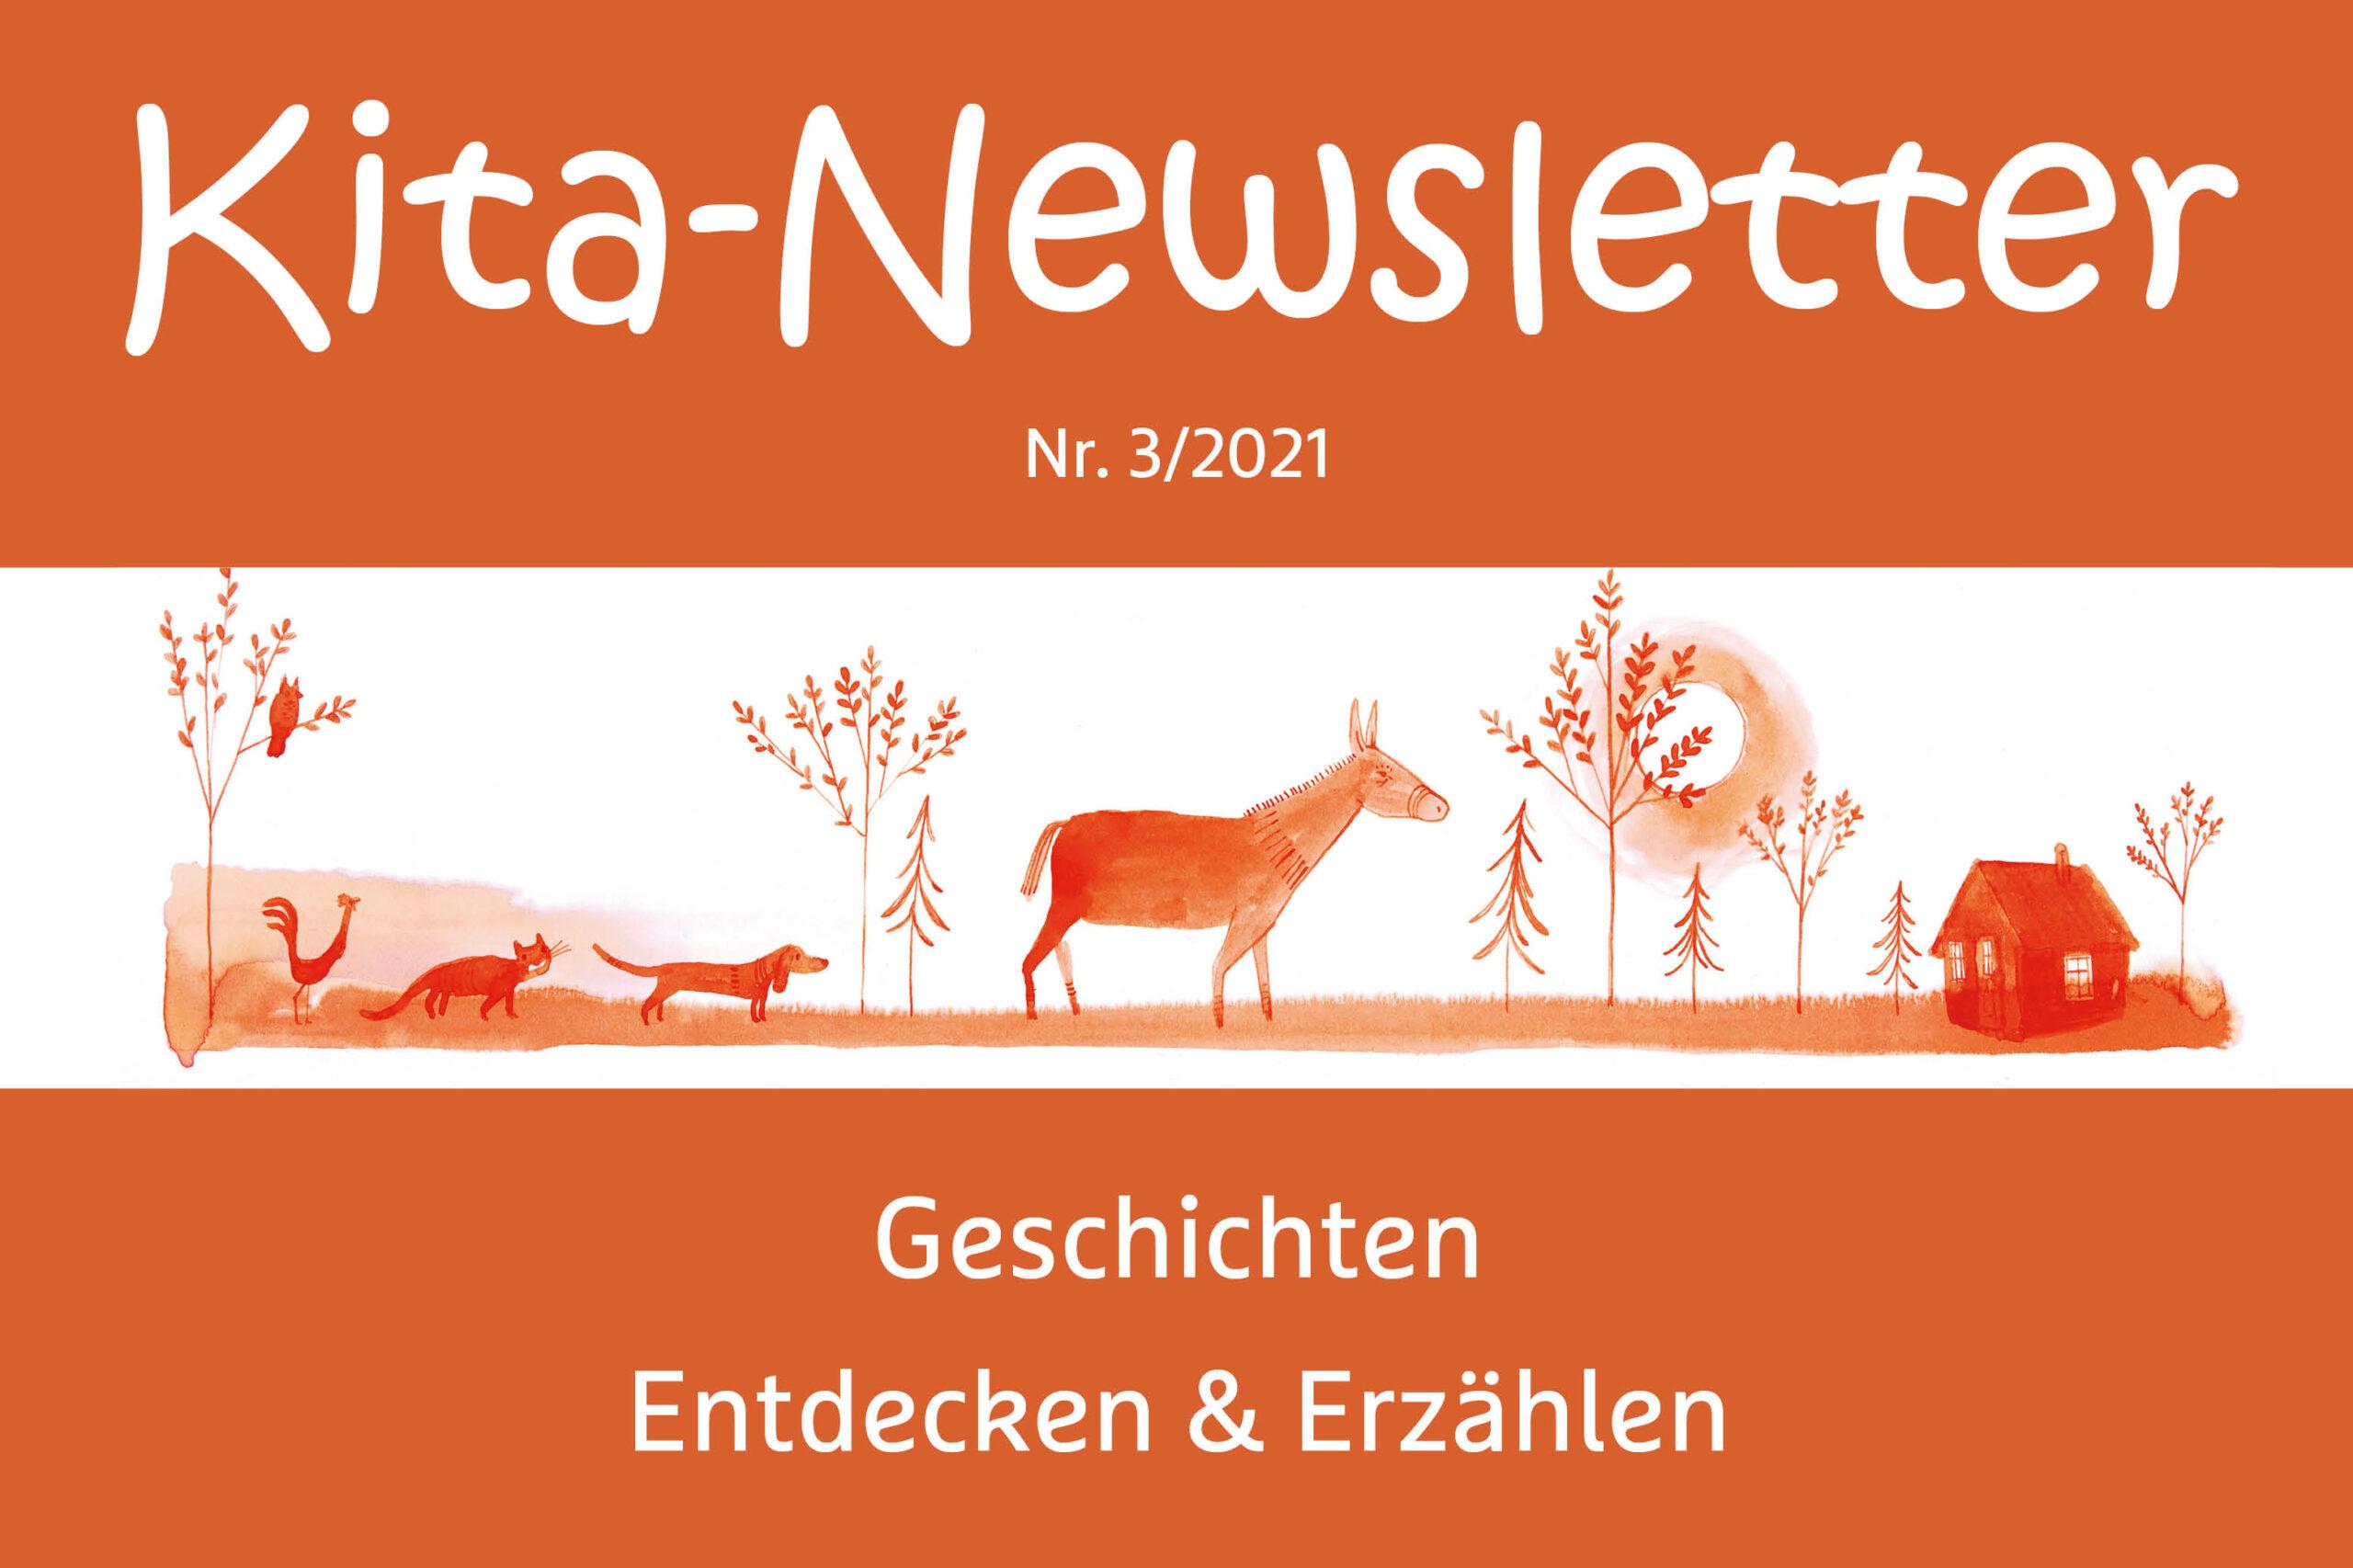 Kita-Newsletter Geschichten übrall